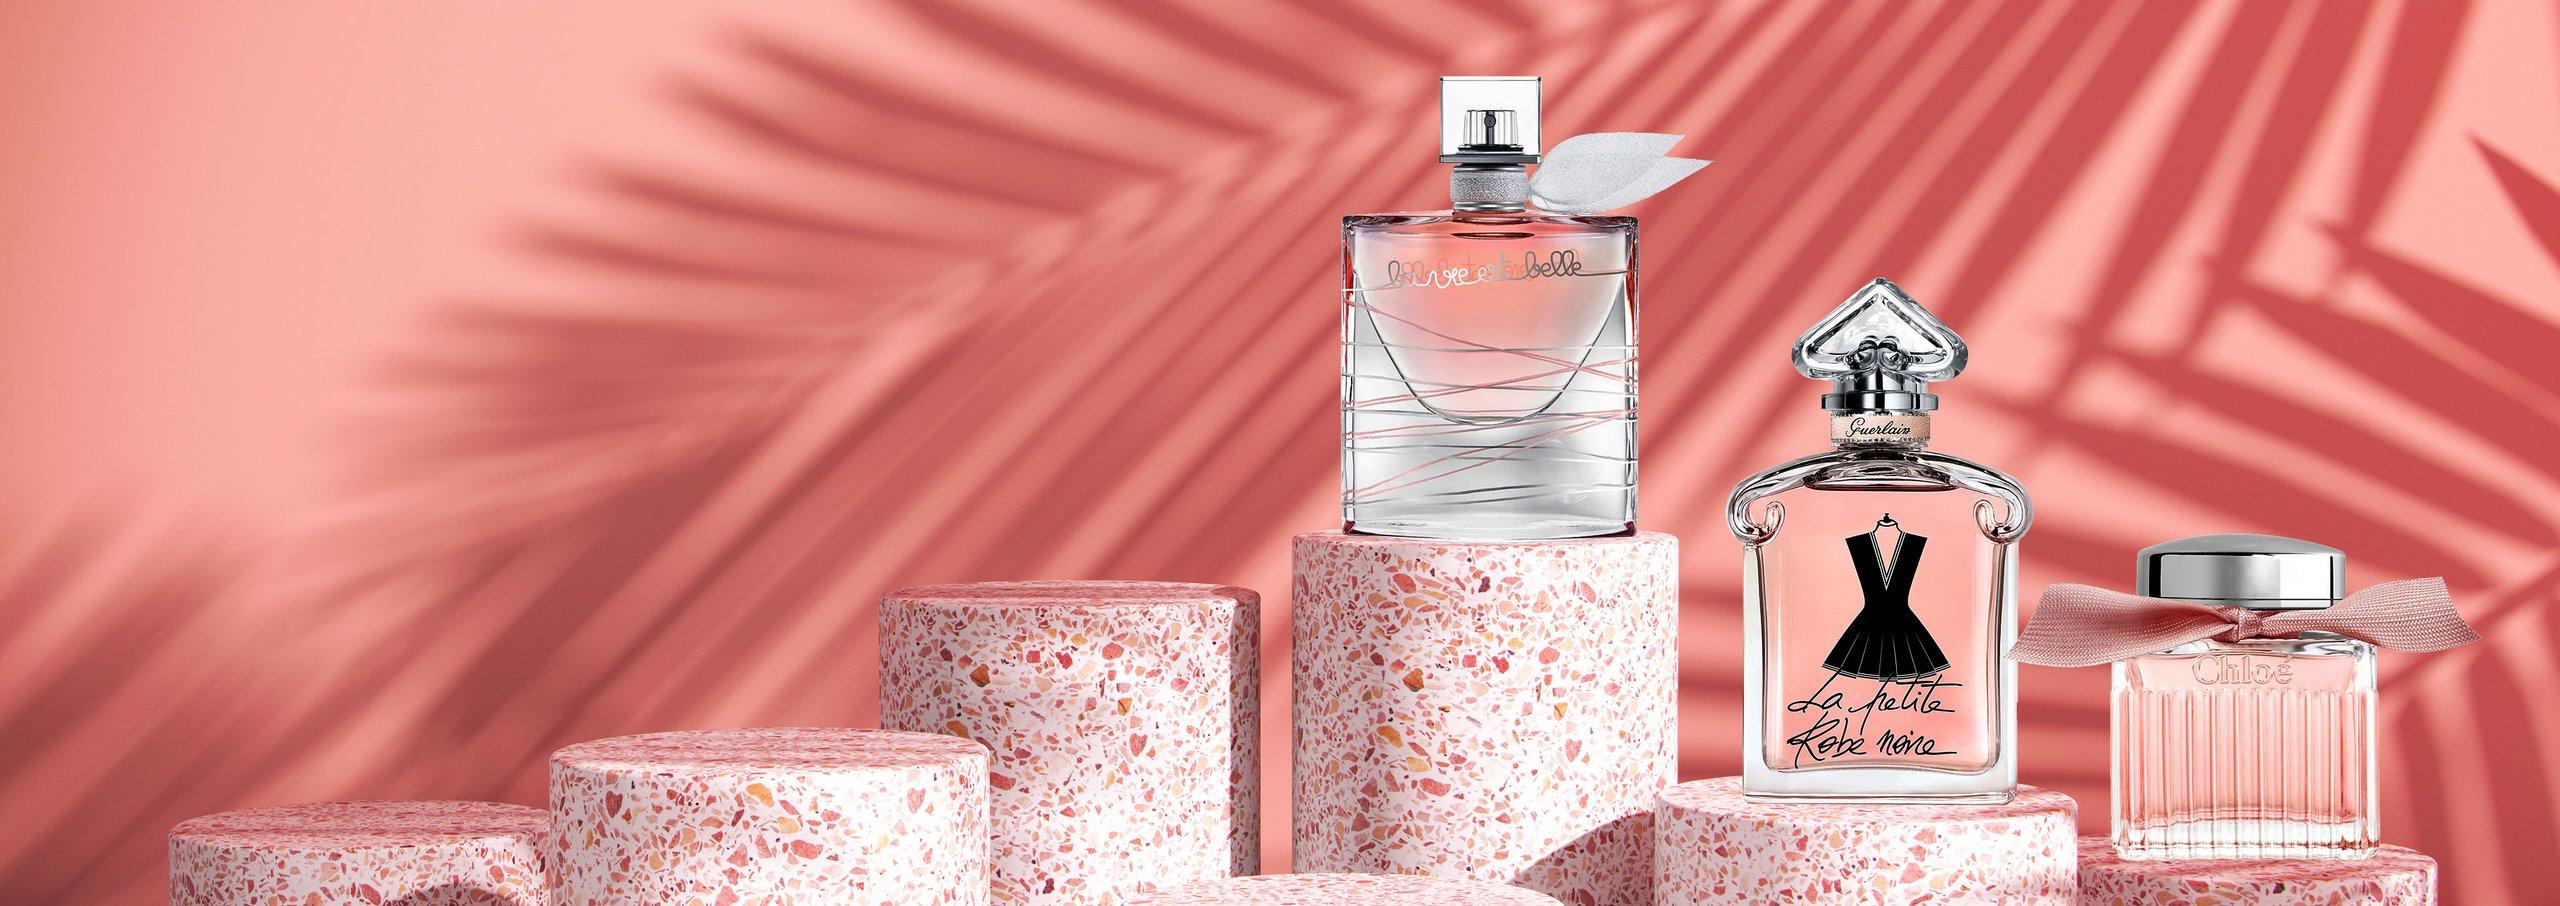 Up – April Make Parfum Beauty Soin K3TuFJl1c